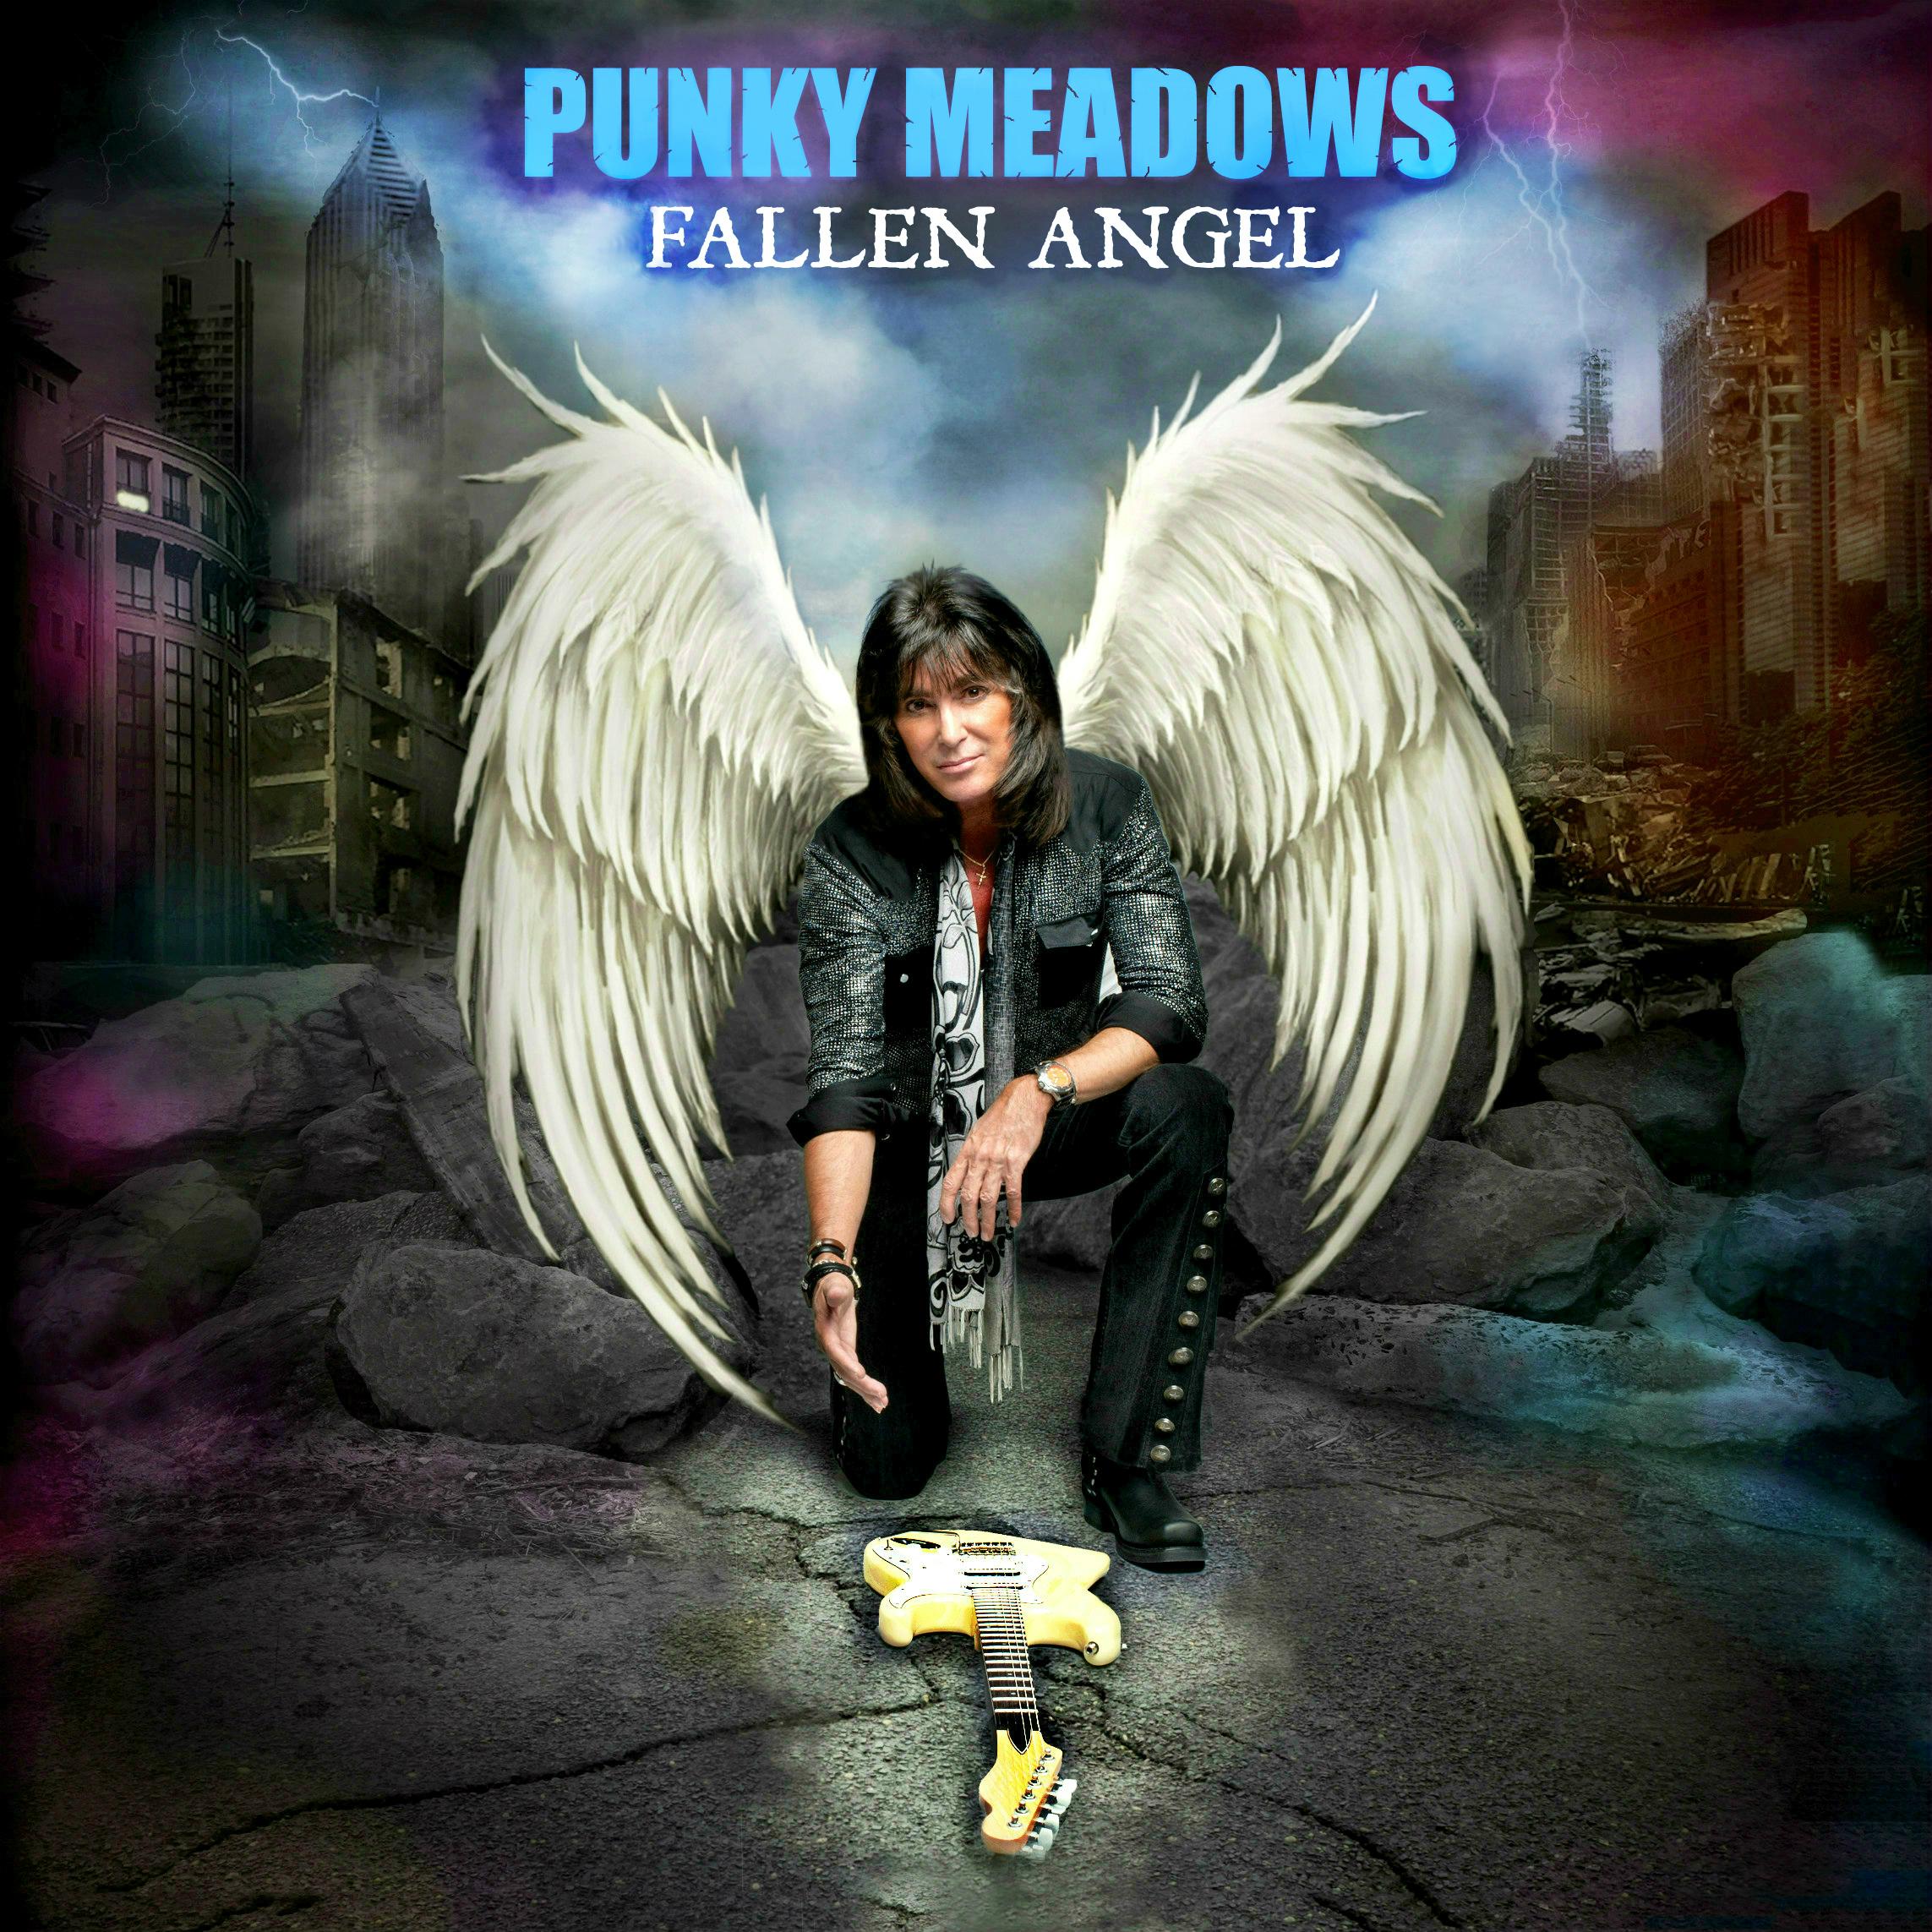 Punky Meadows - Fallen Angel - Main Man Records